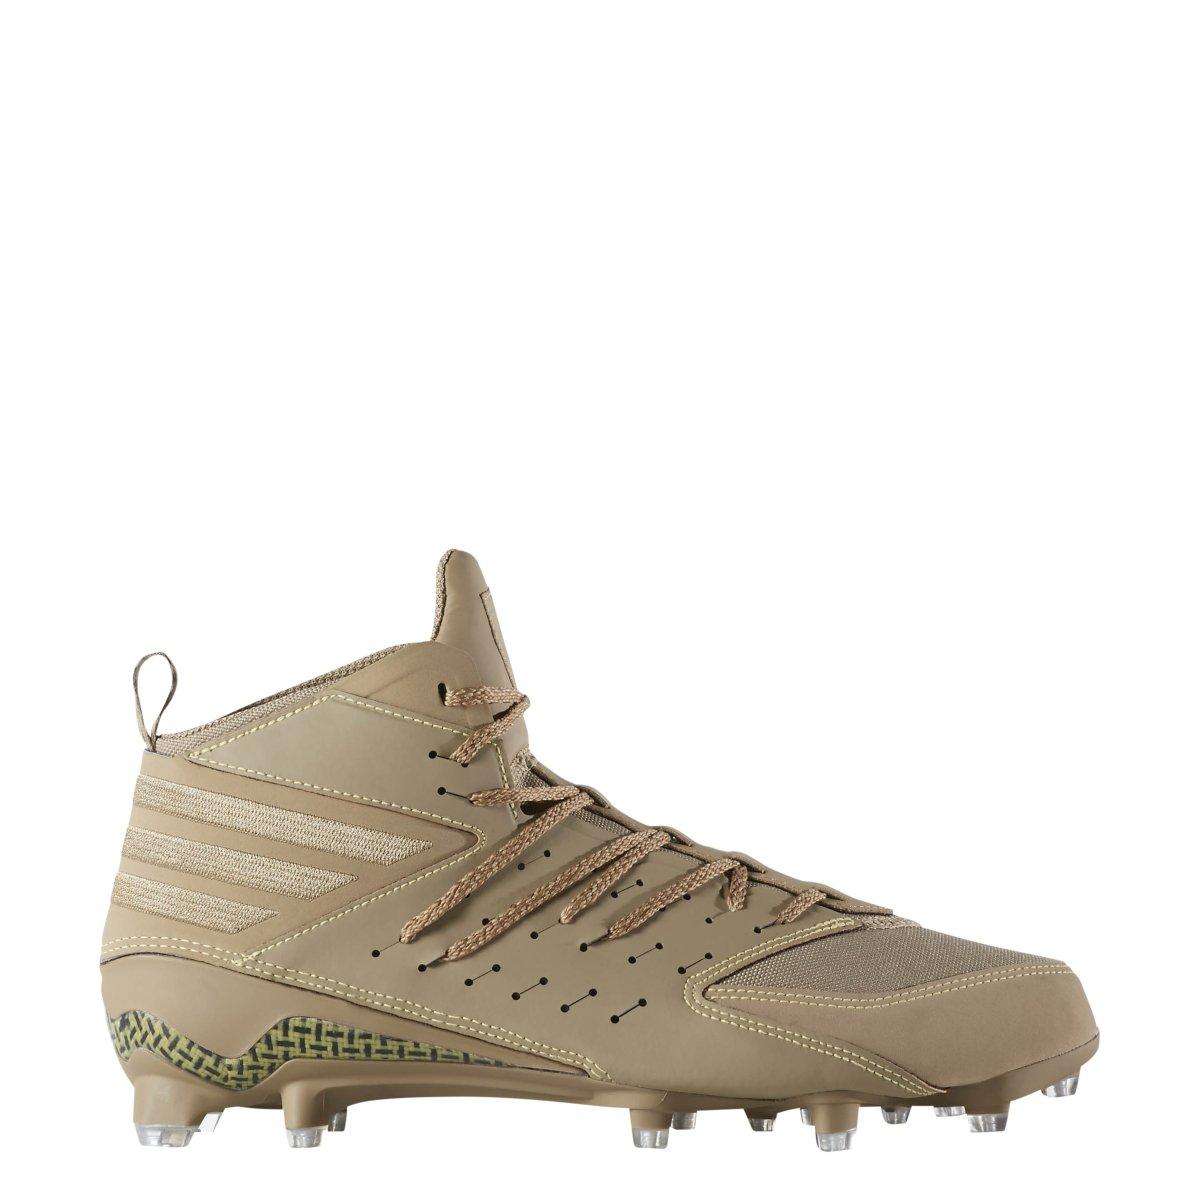 adidas Dark Ops Freak X Kevlar Cleat Men's Football